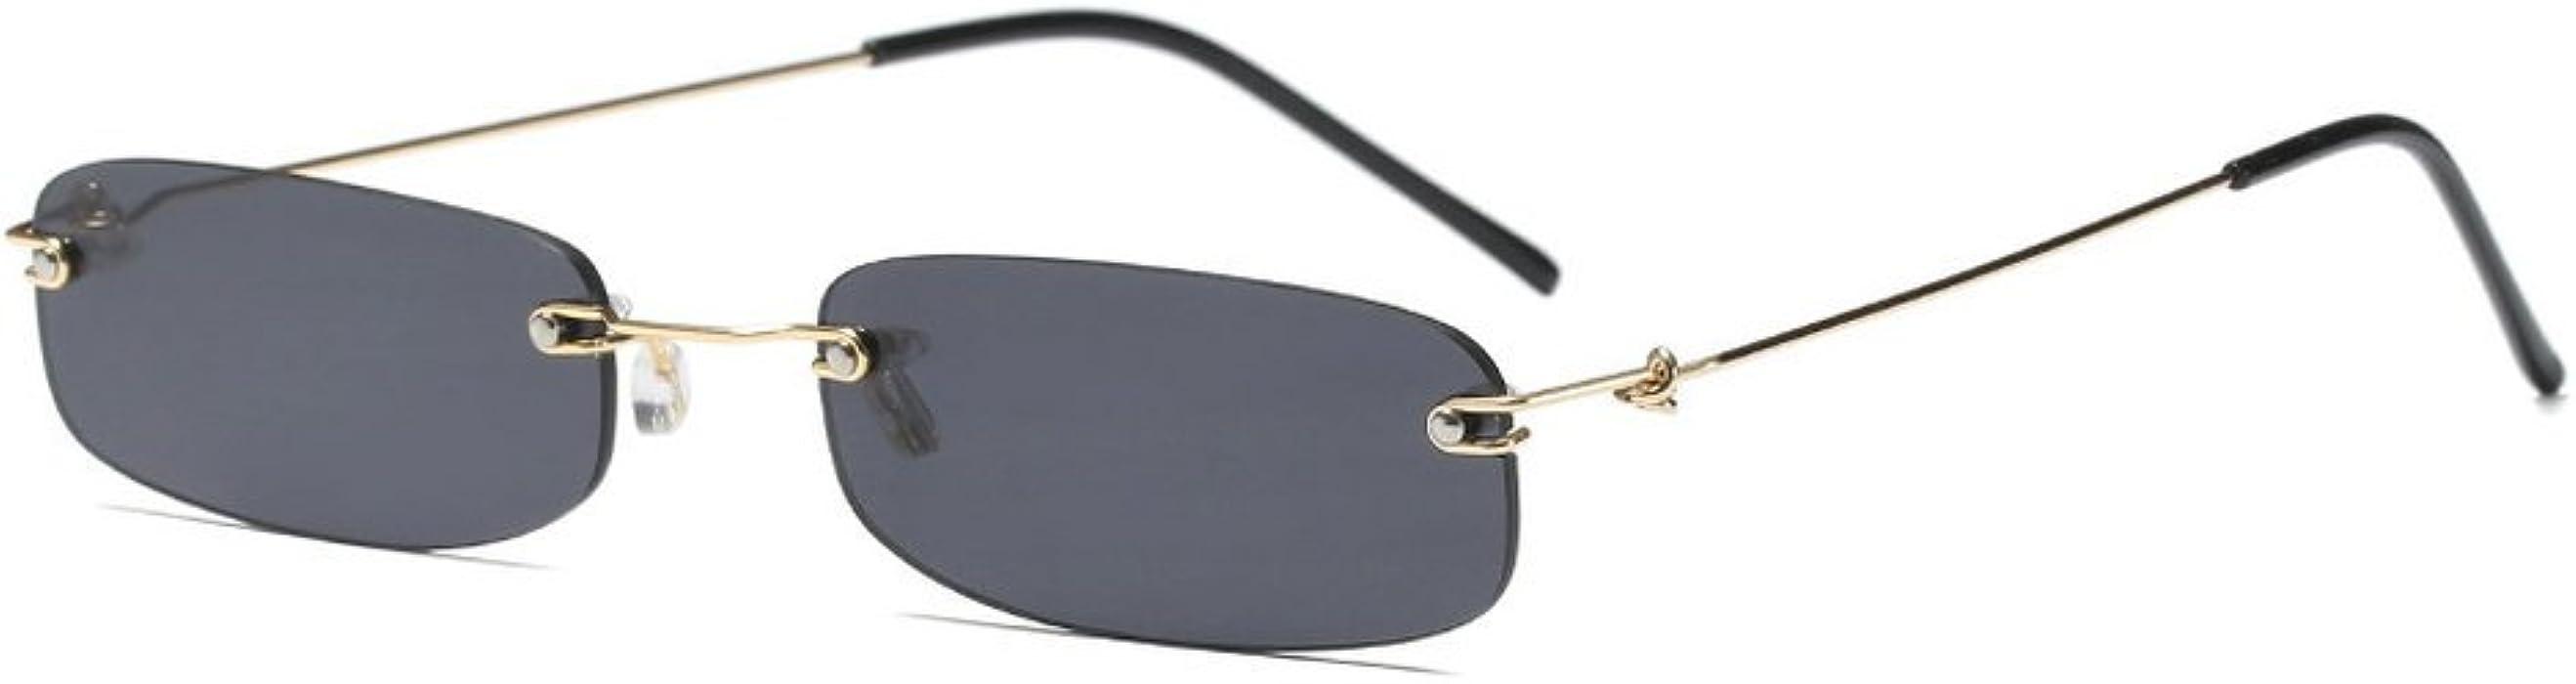 c346d203154 MINCL Small Chic Rectangular Rimless Sunglasses Women Men Fashion Vintage  Design UV400 (black)